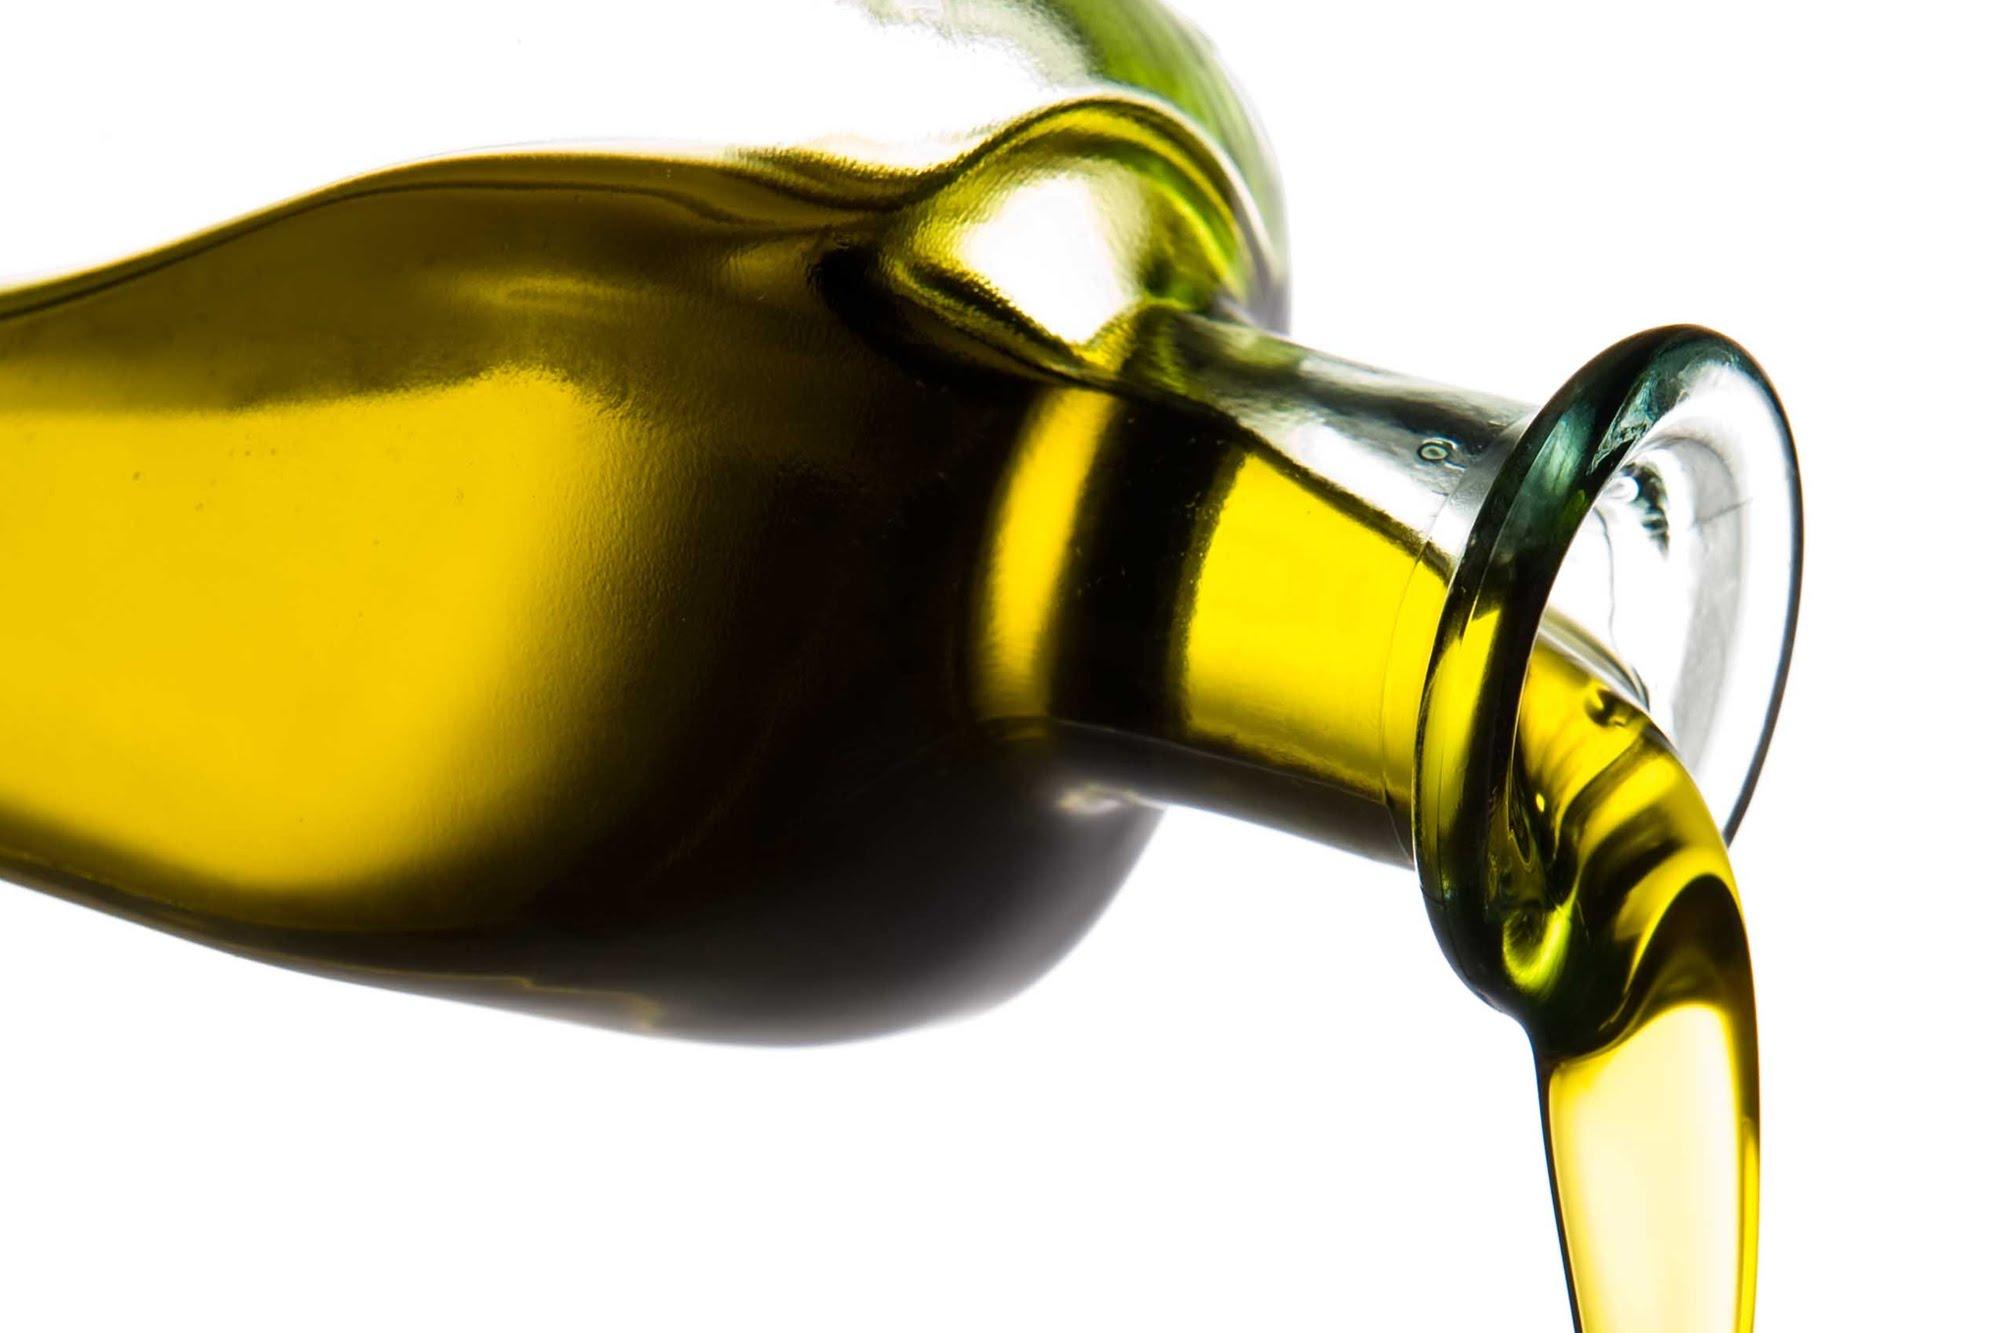 Equilibrio - Extra Virgin Olive Oil